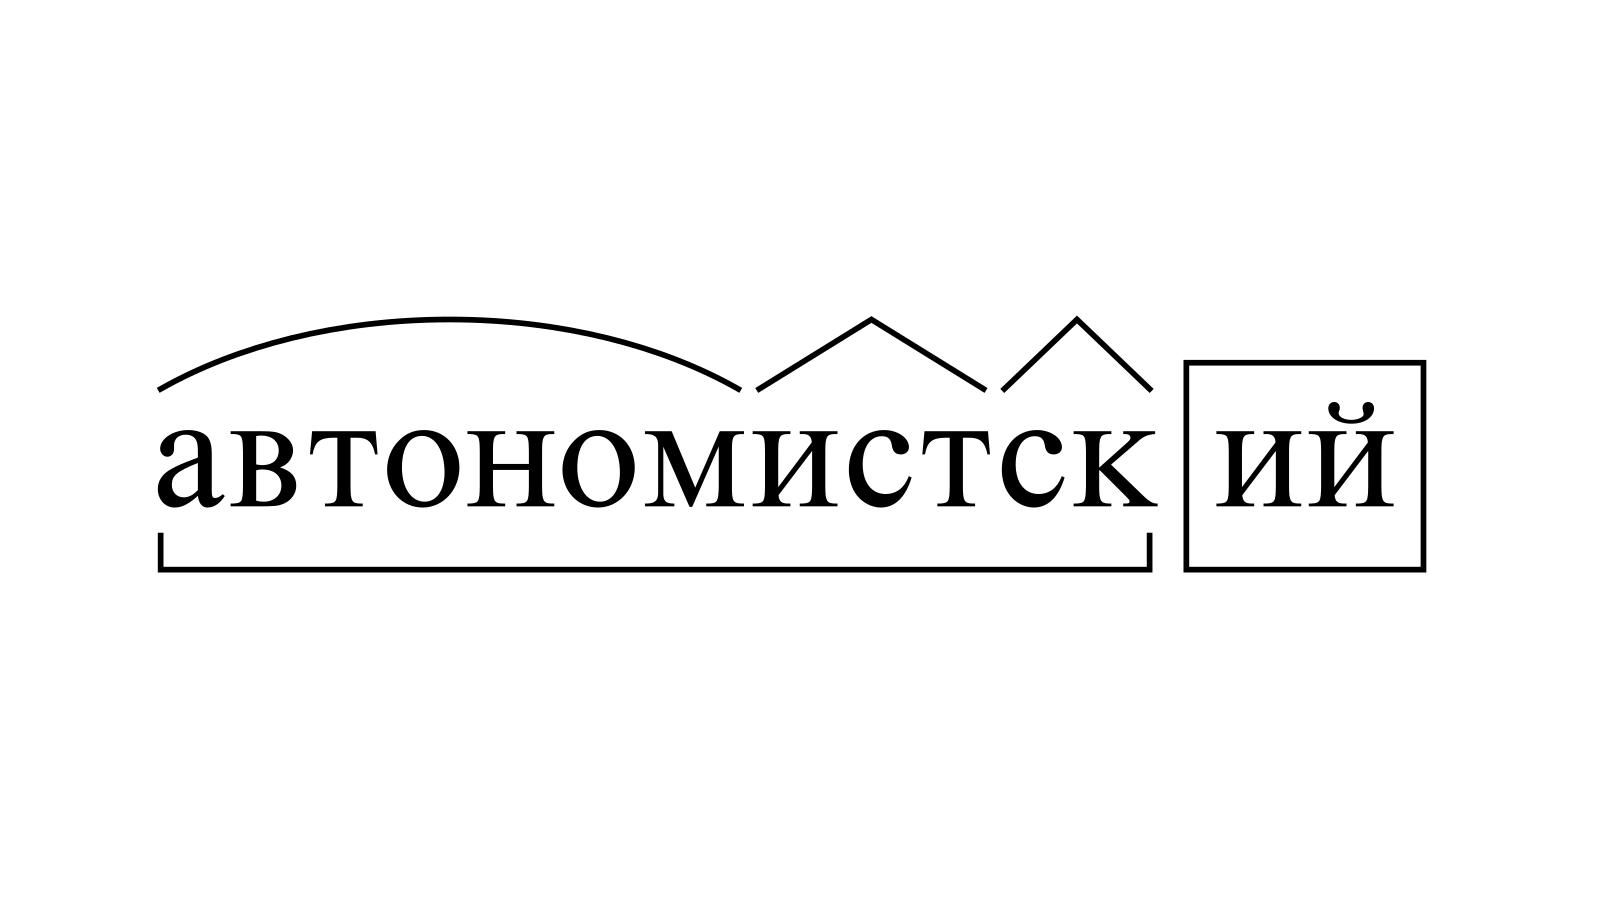 Разбор слова «автономистский» по составу